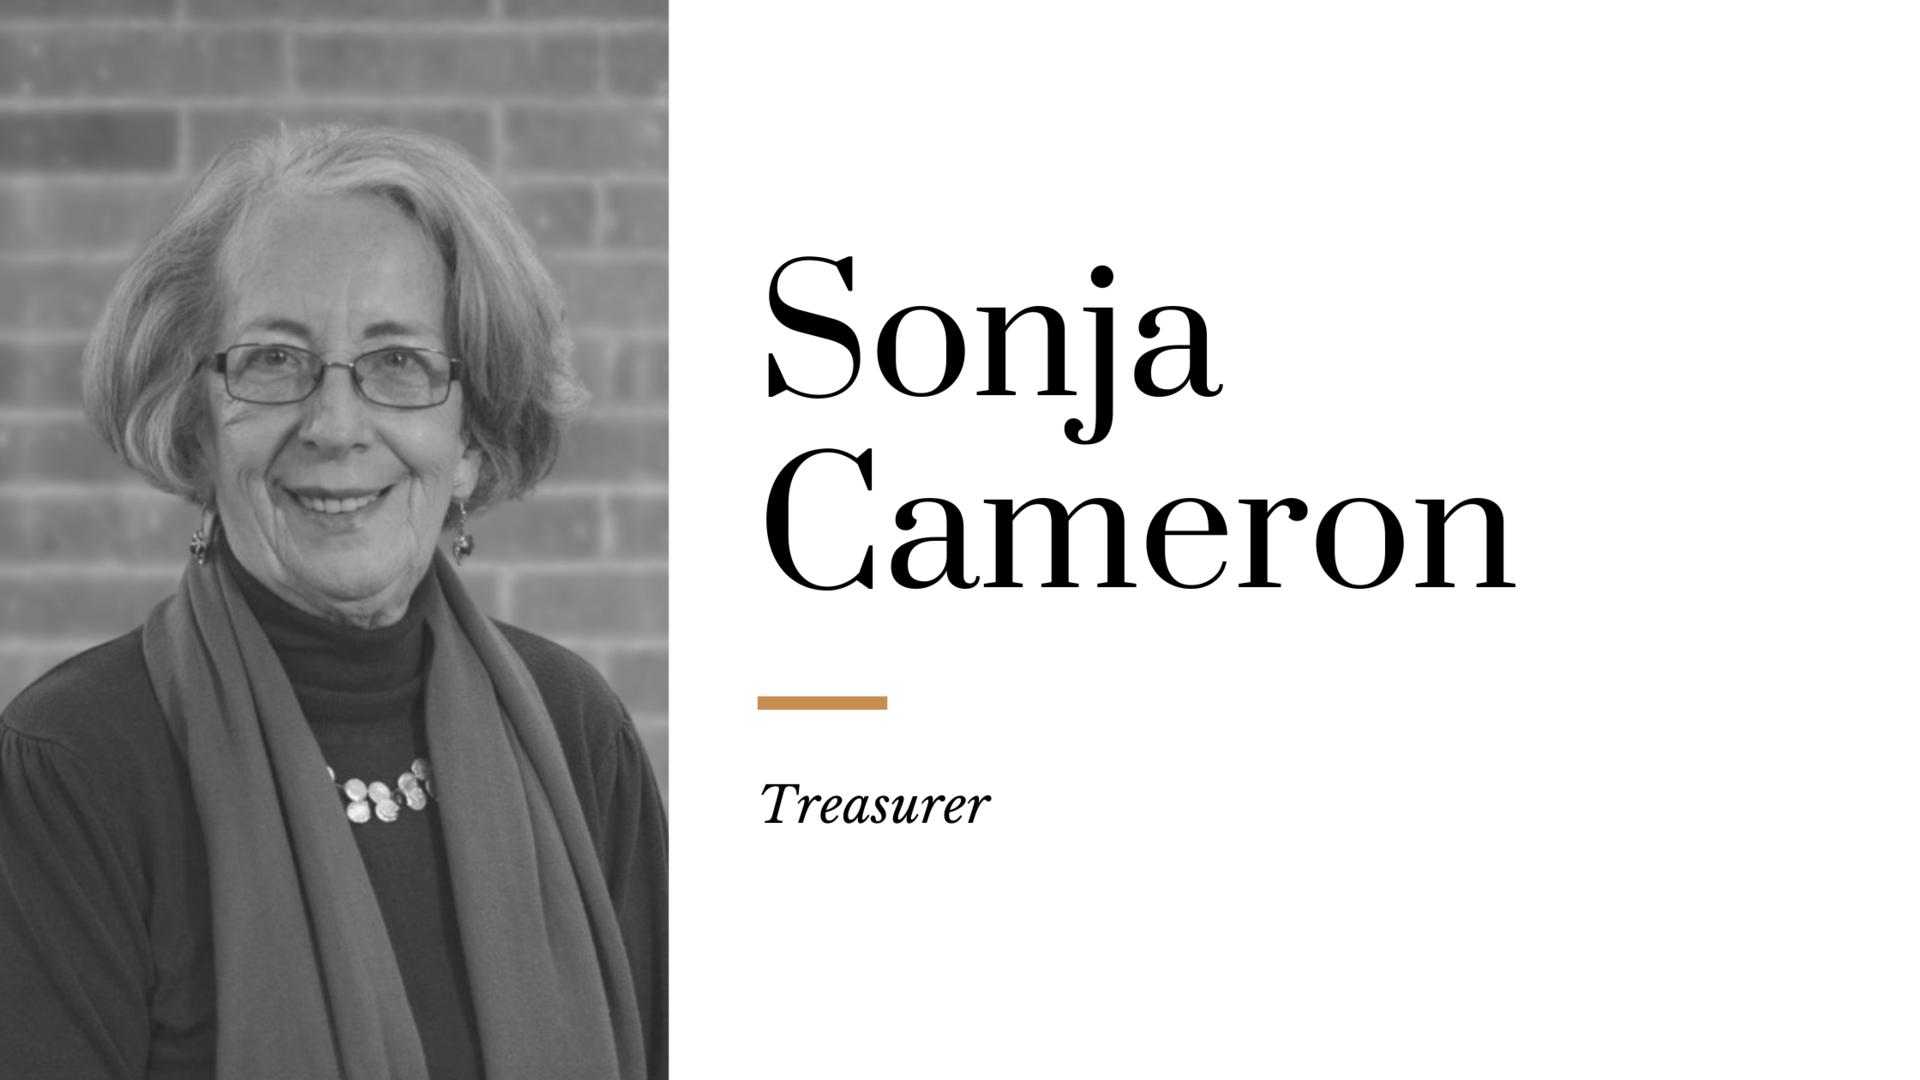 Sonja Cameron - Treasurer